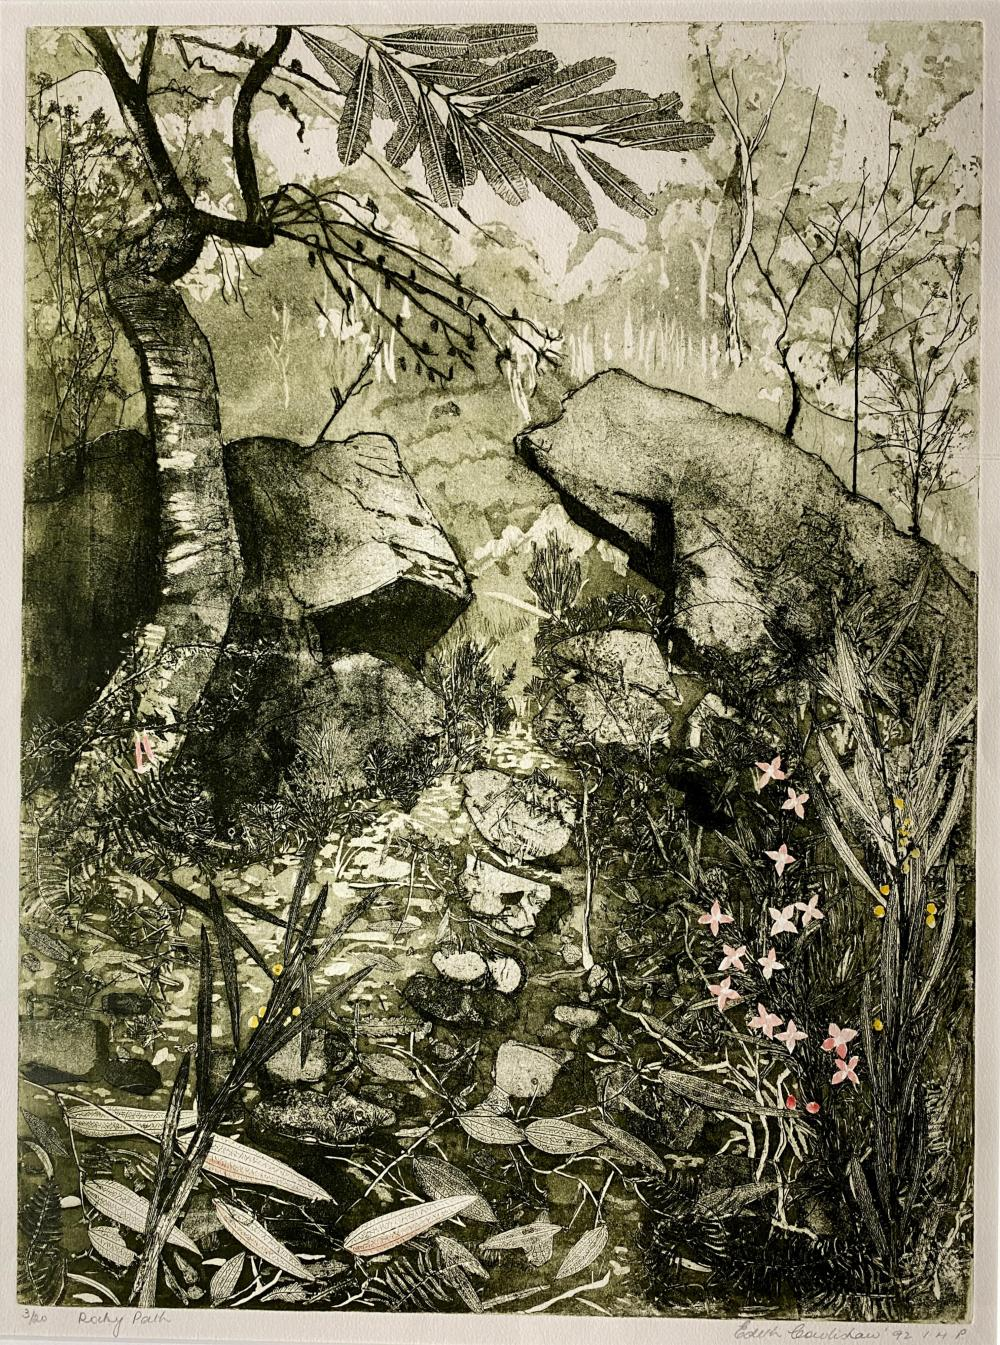 Edith Cowlishaw, (1924-), Rocky Path 1992, Handcoloured etching ed. 3/20